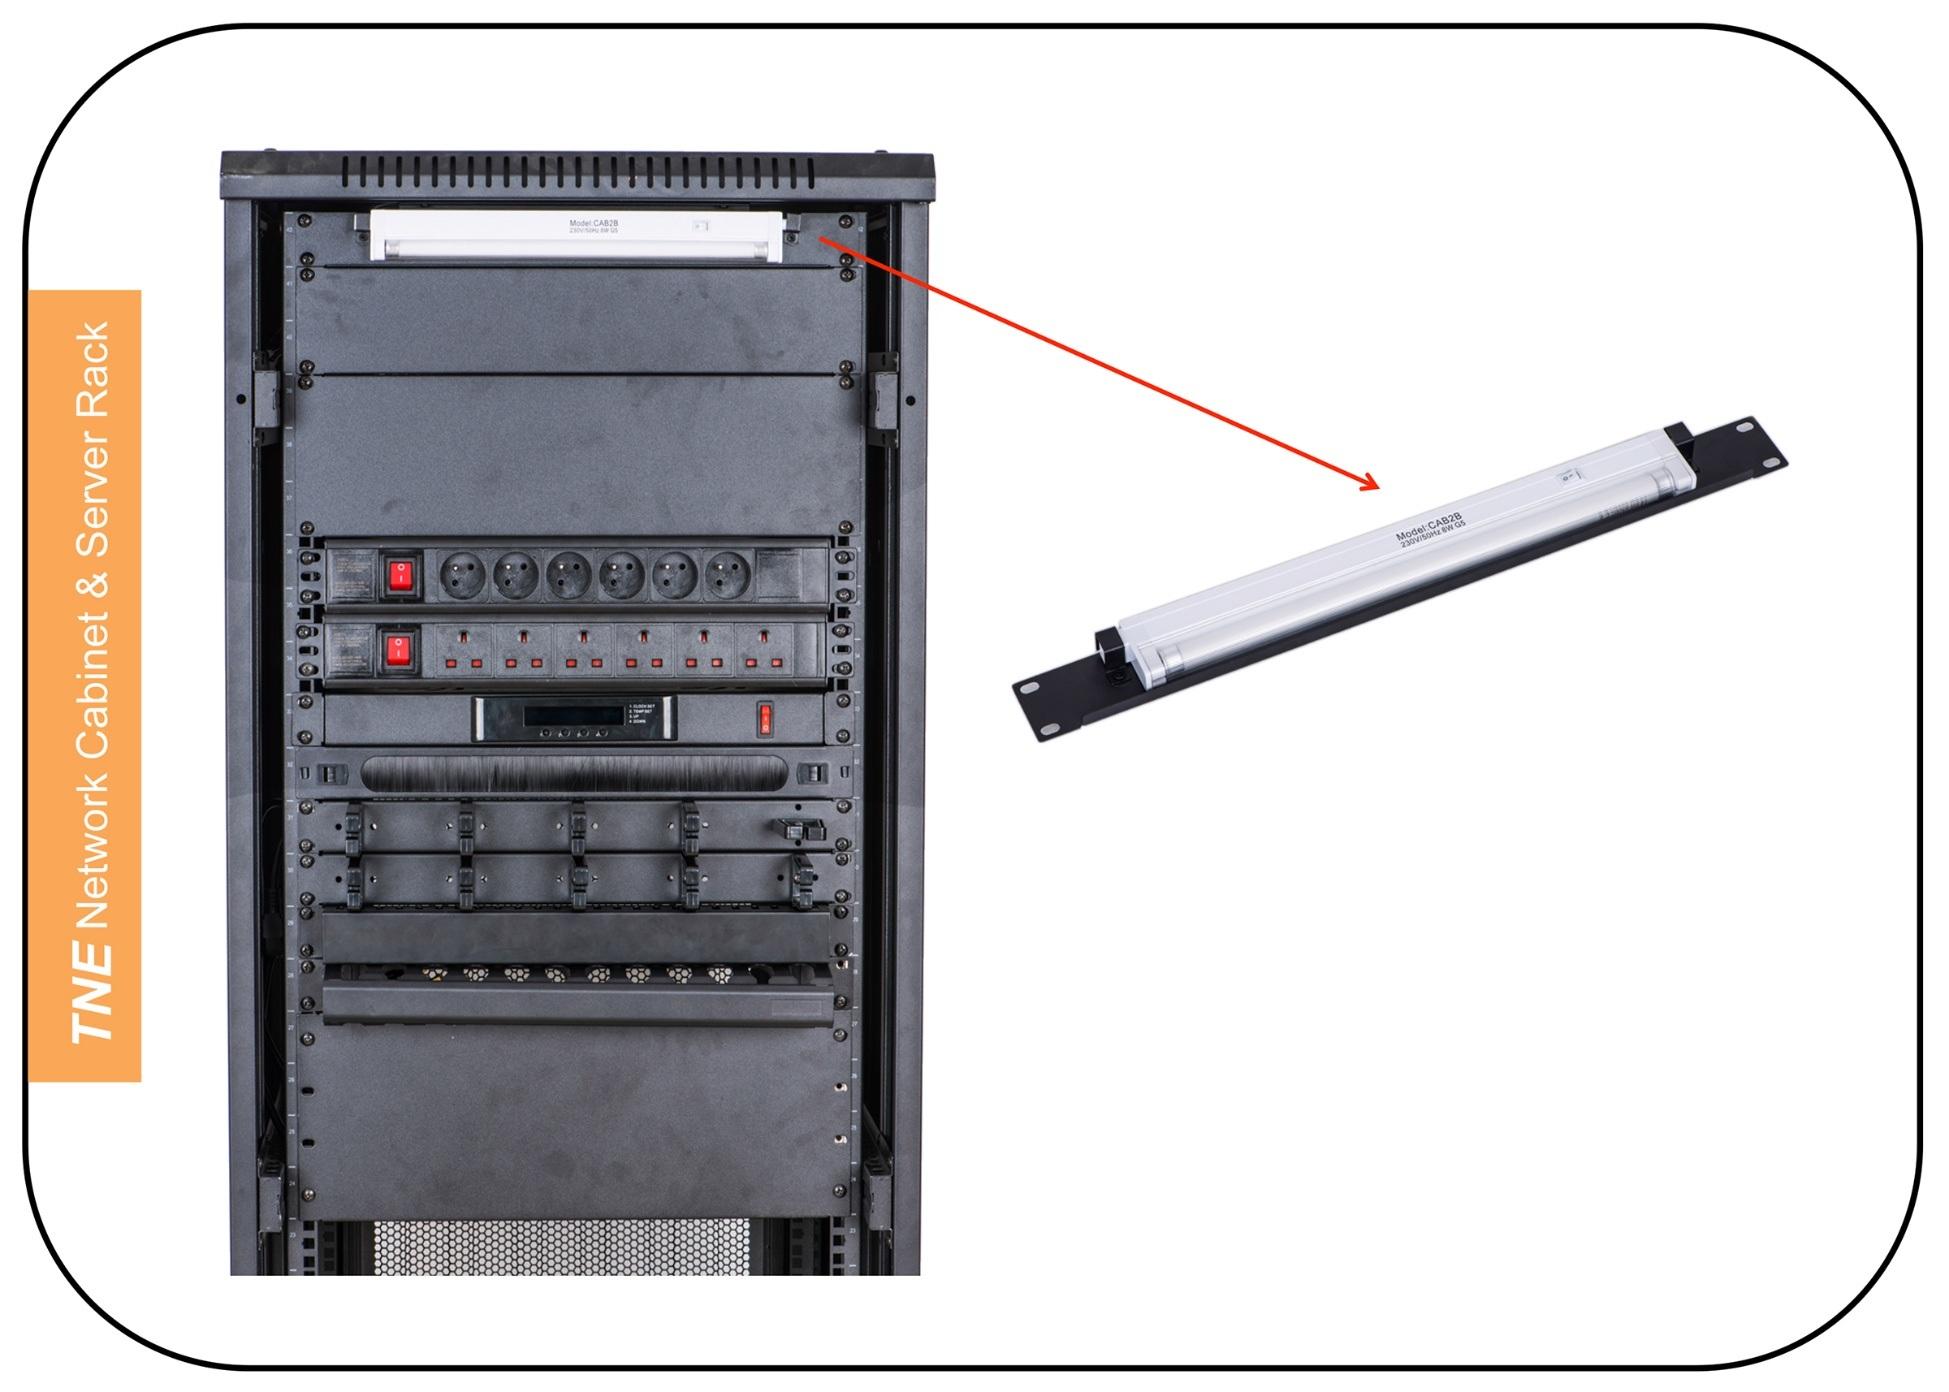 our in datacenter cabinetshelves cabinet elegant shelves cabling of fresh new kvm network brand club